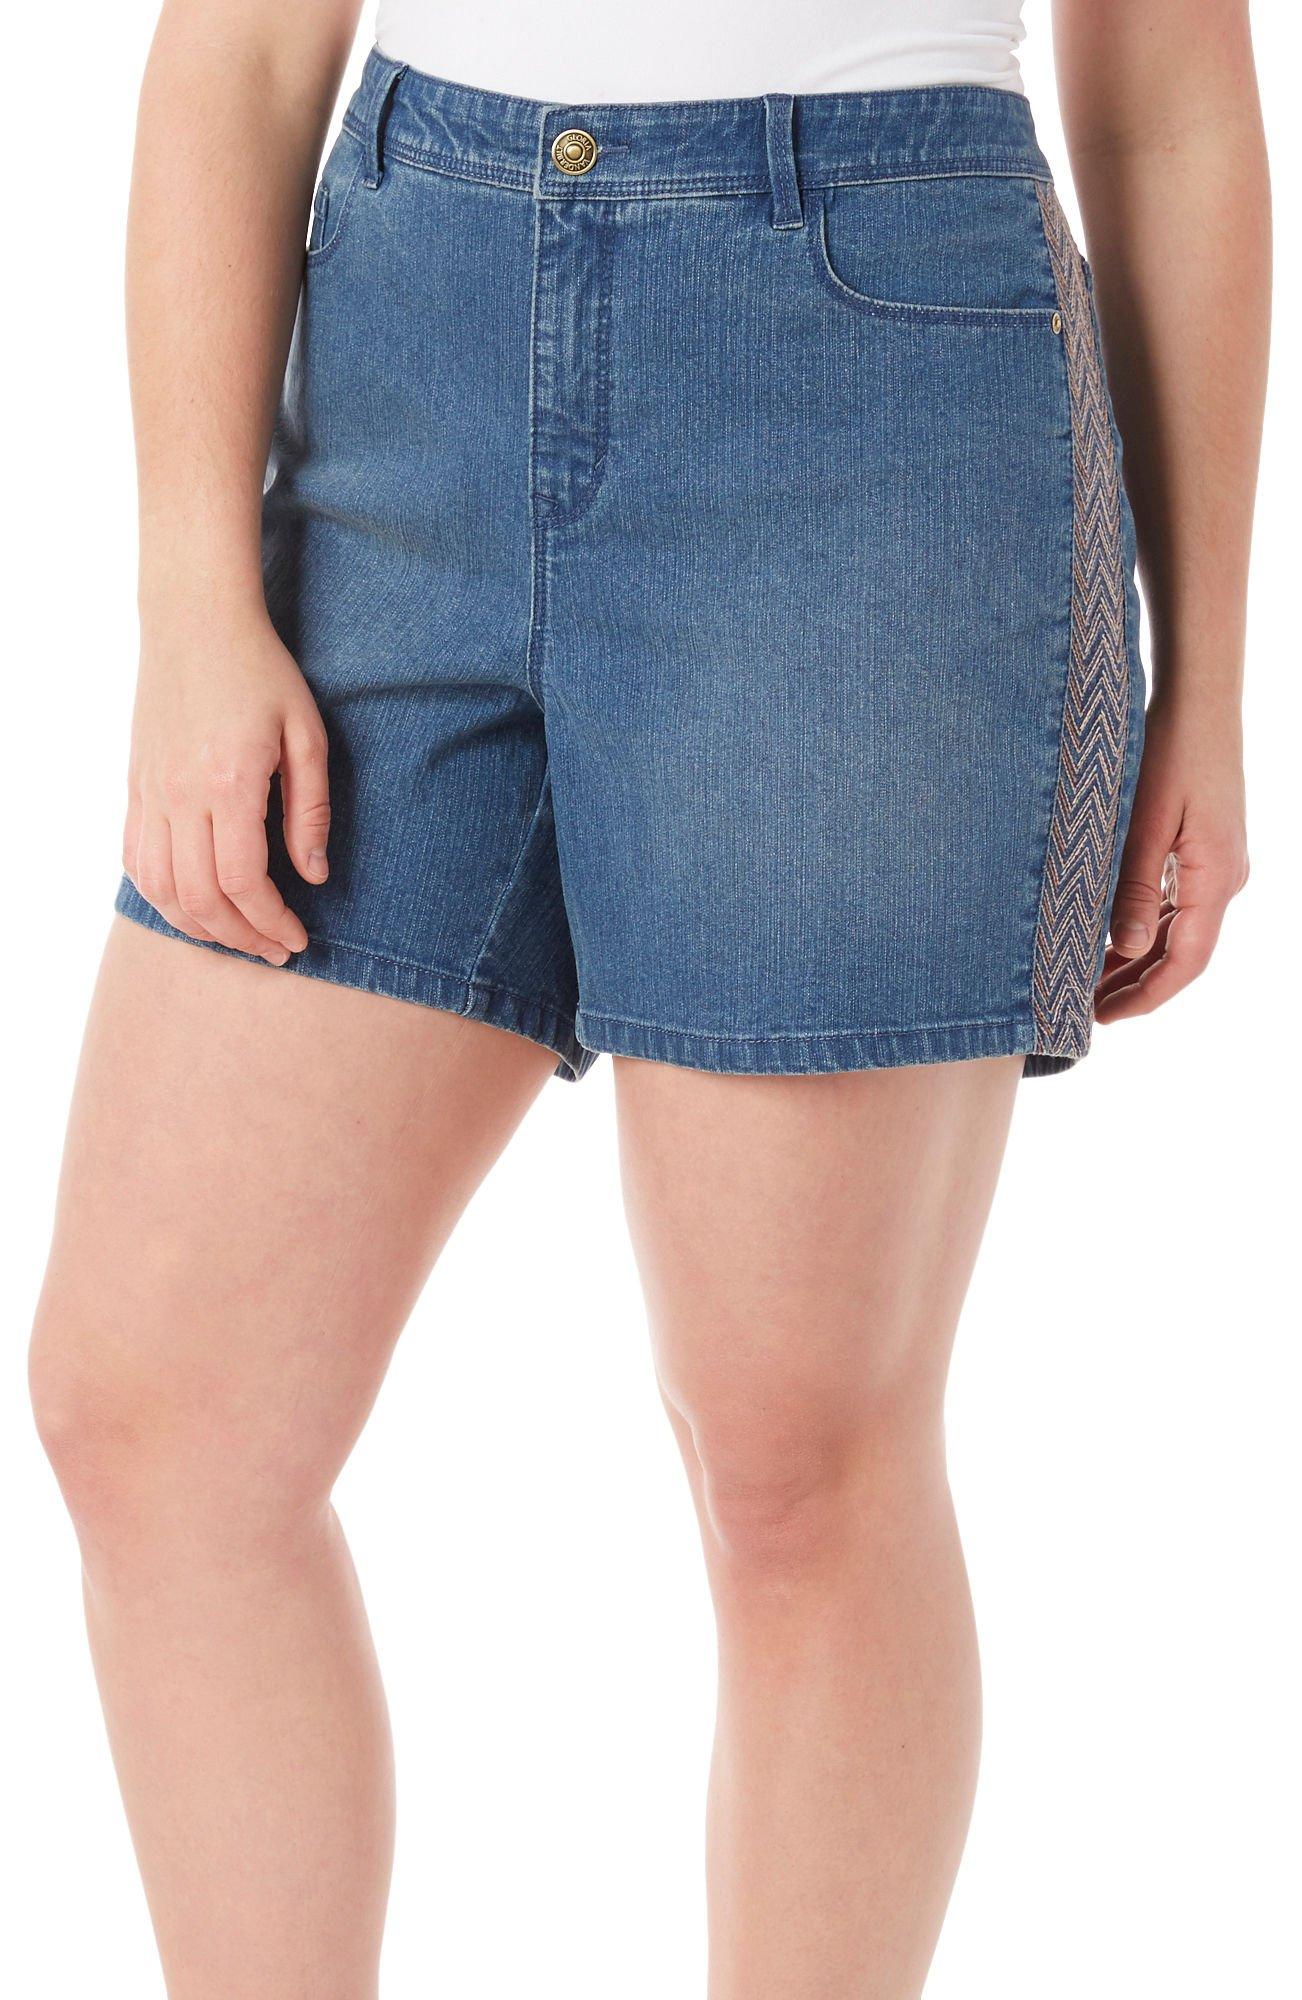 Gloria Vanderbilt Danica Blue Jean Sundance Embellished Plus Size Short New (22 Plus)